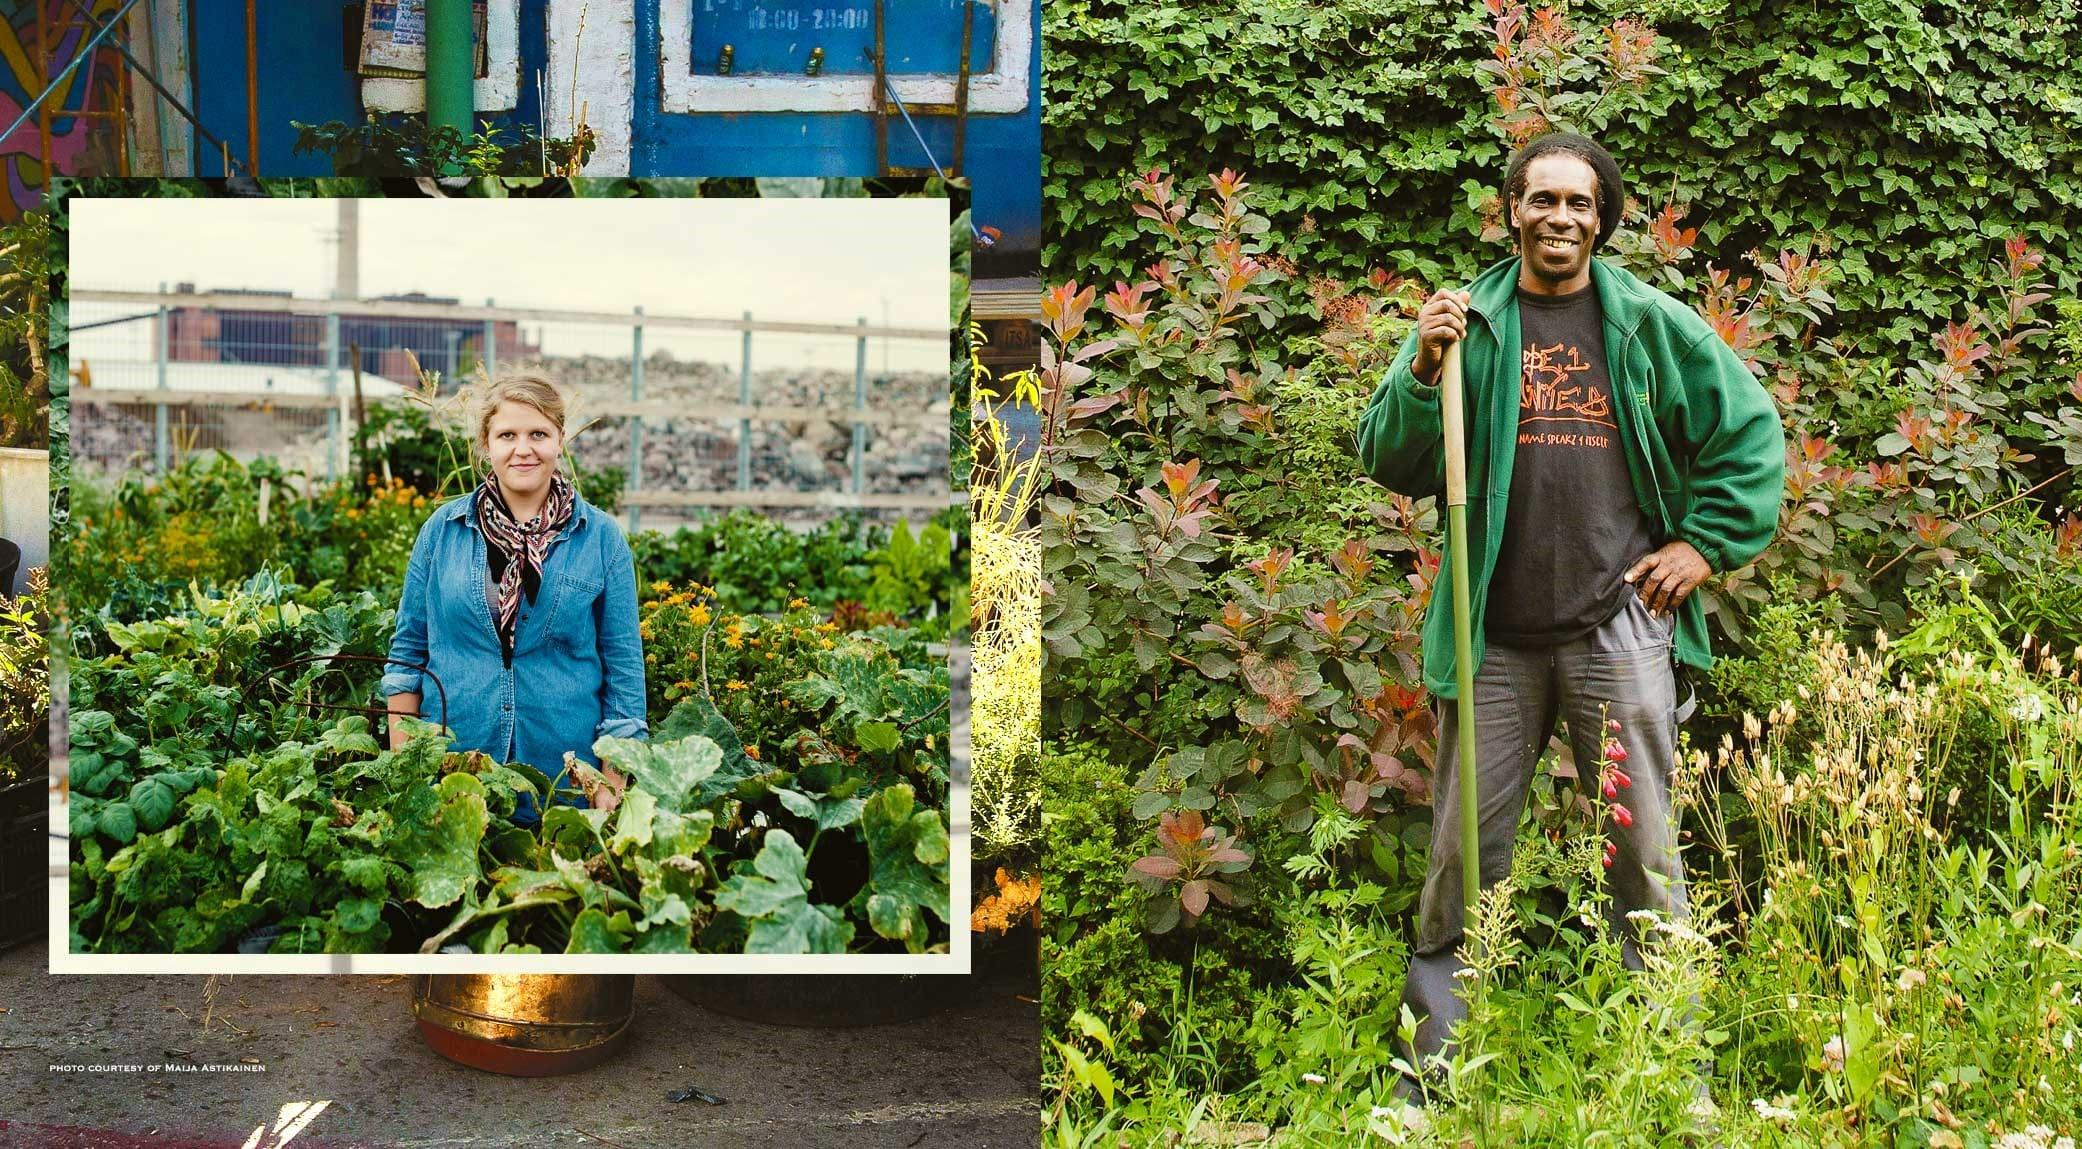 original_006-Horticultured-Cities-finedininglovers.jpg